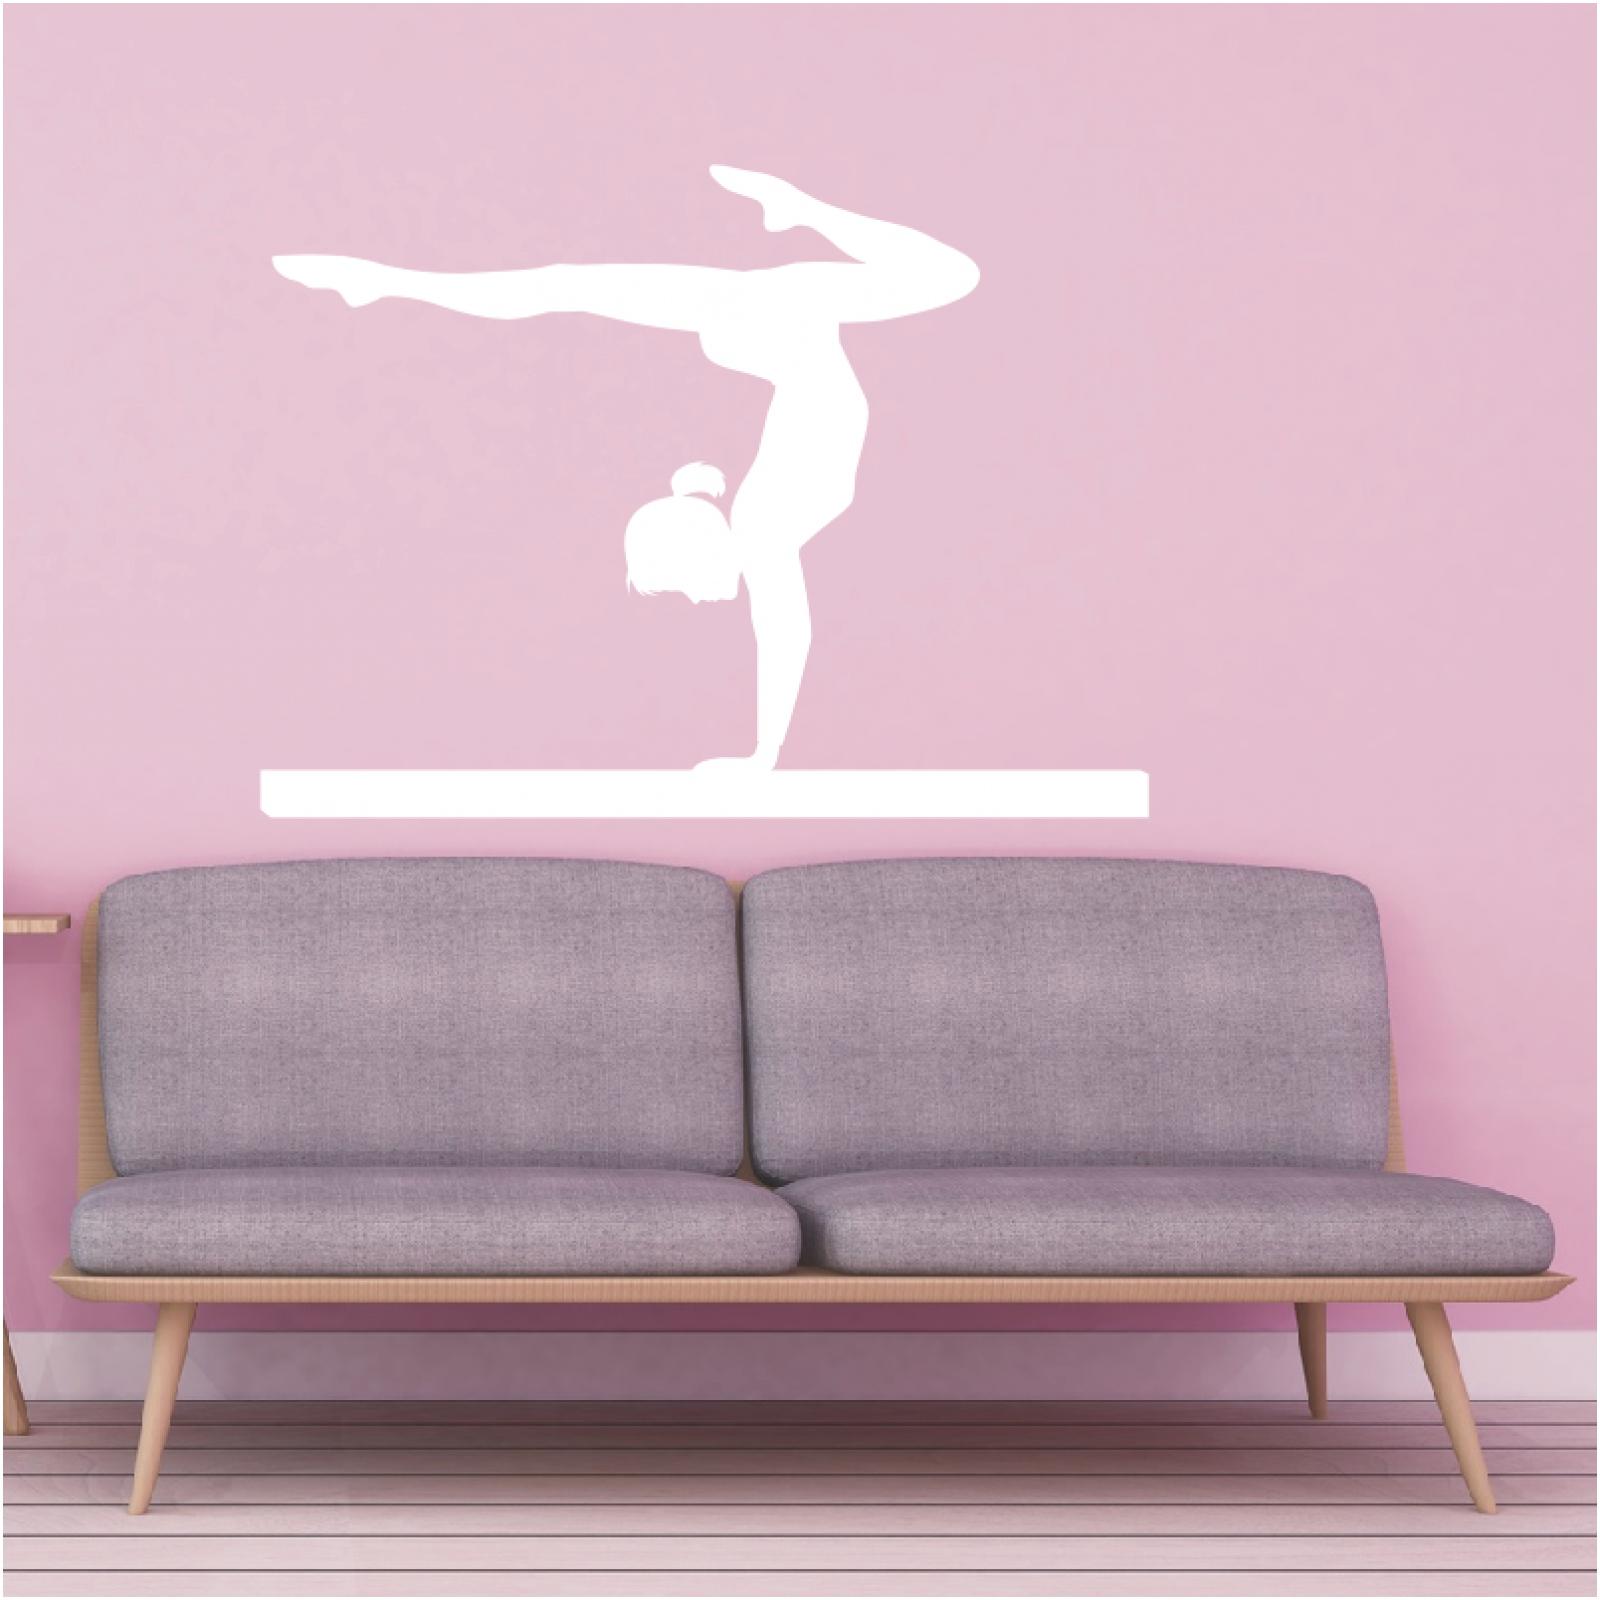 schatten wandtattoo turnen barren schwebebalken sport wandaufkleber deko1 ebay. Black Bedroom Furniture Sets. Home Design Ideas